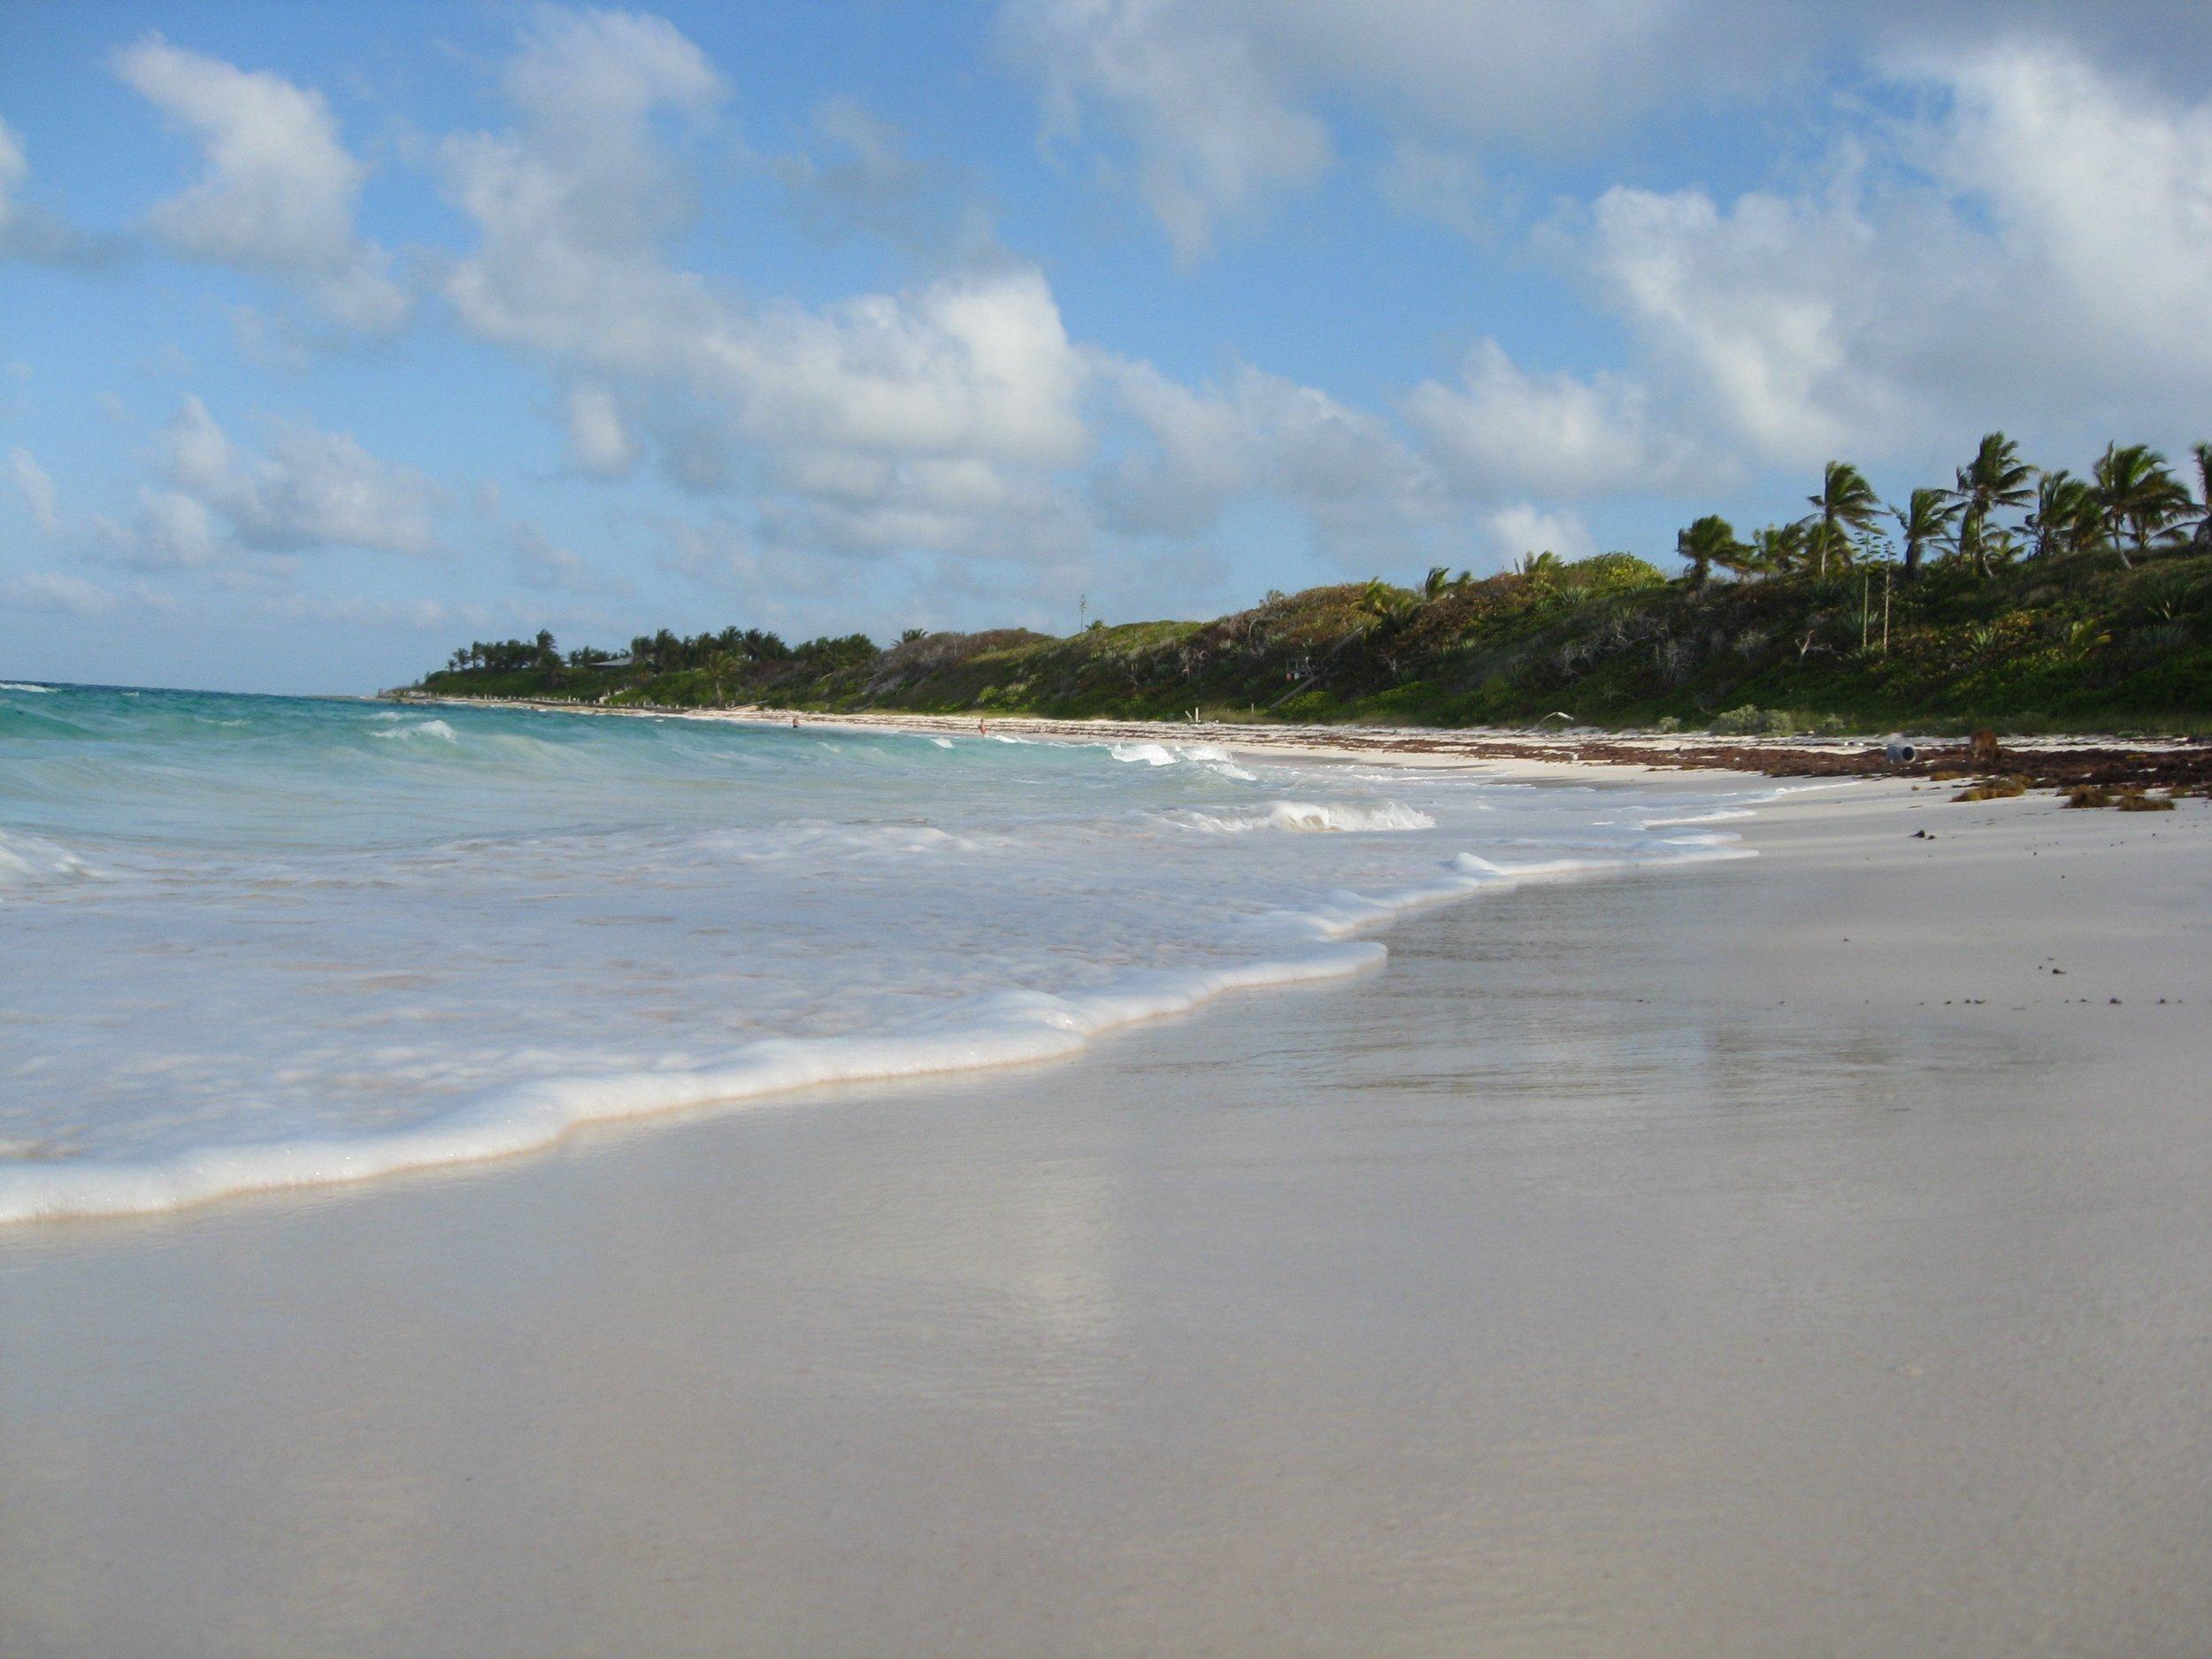 Atlantic side of Eleuthera